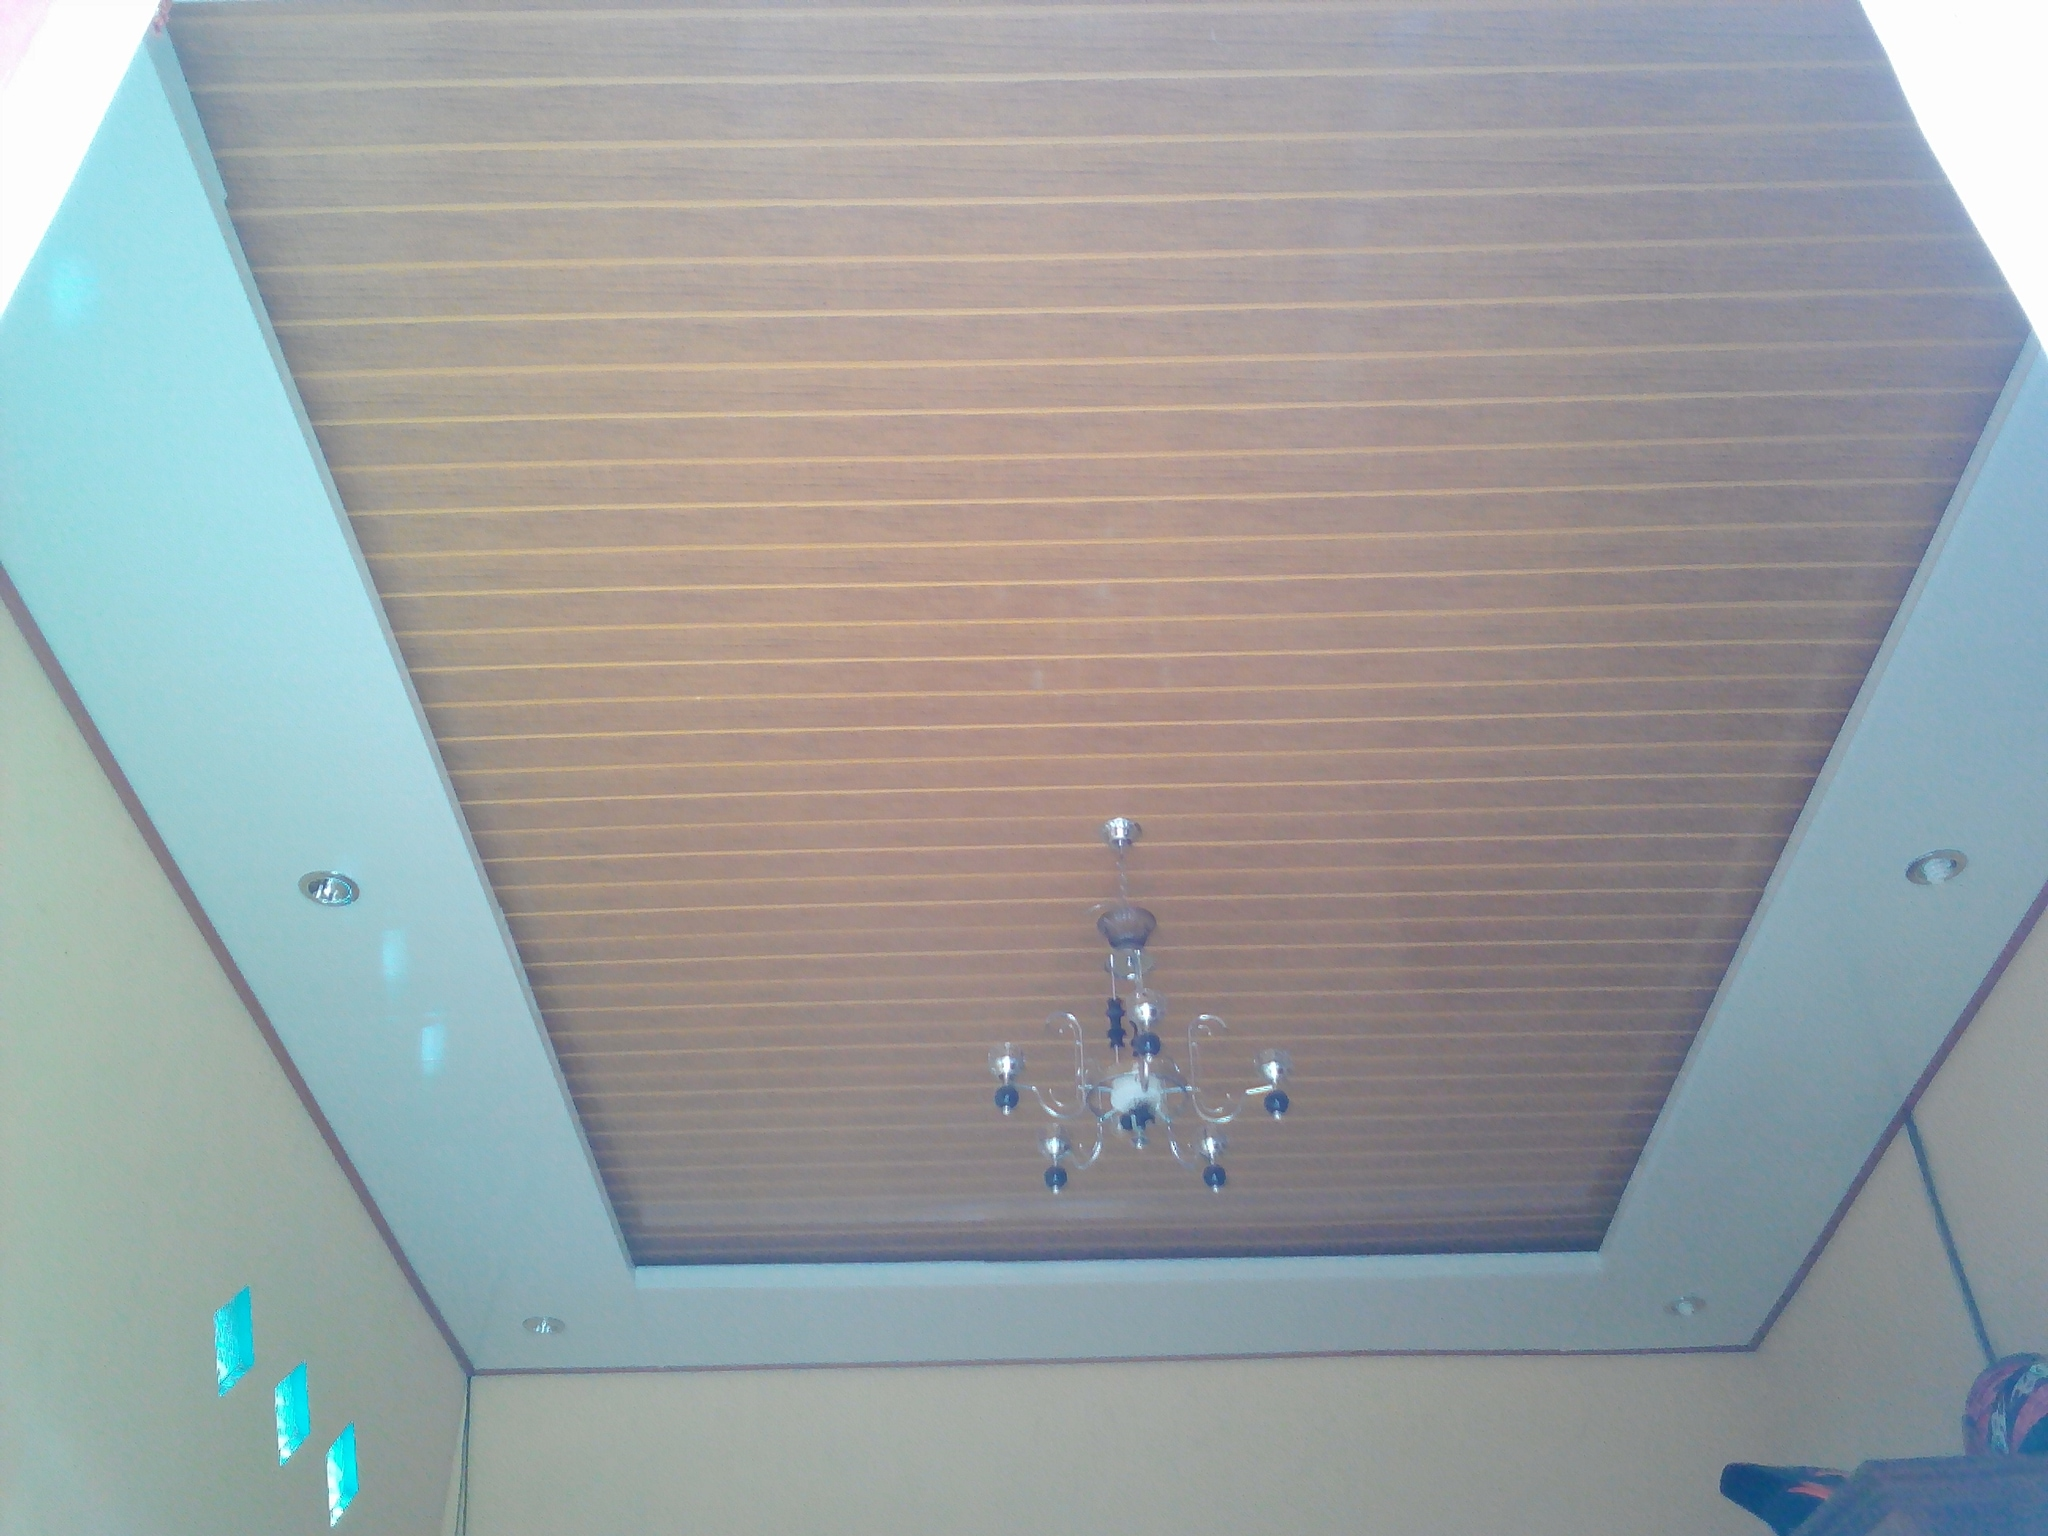 Jual plafond pvc embun embun plafon pvc tokopedia for Plaque plafond salle de bain